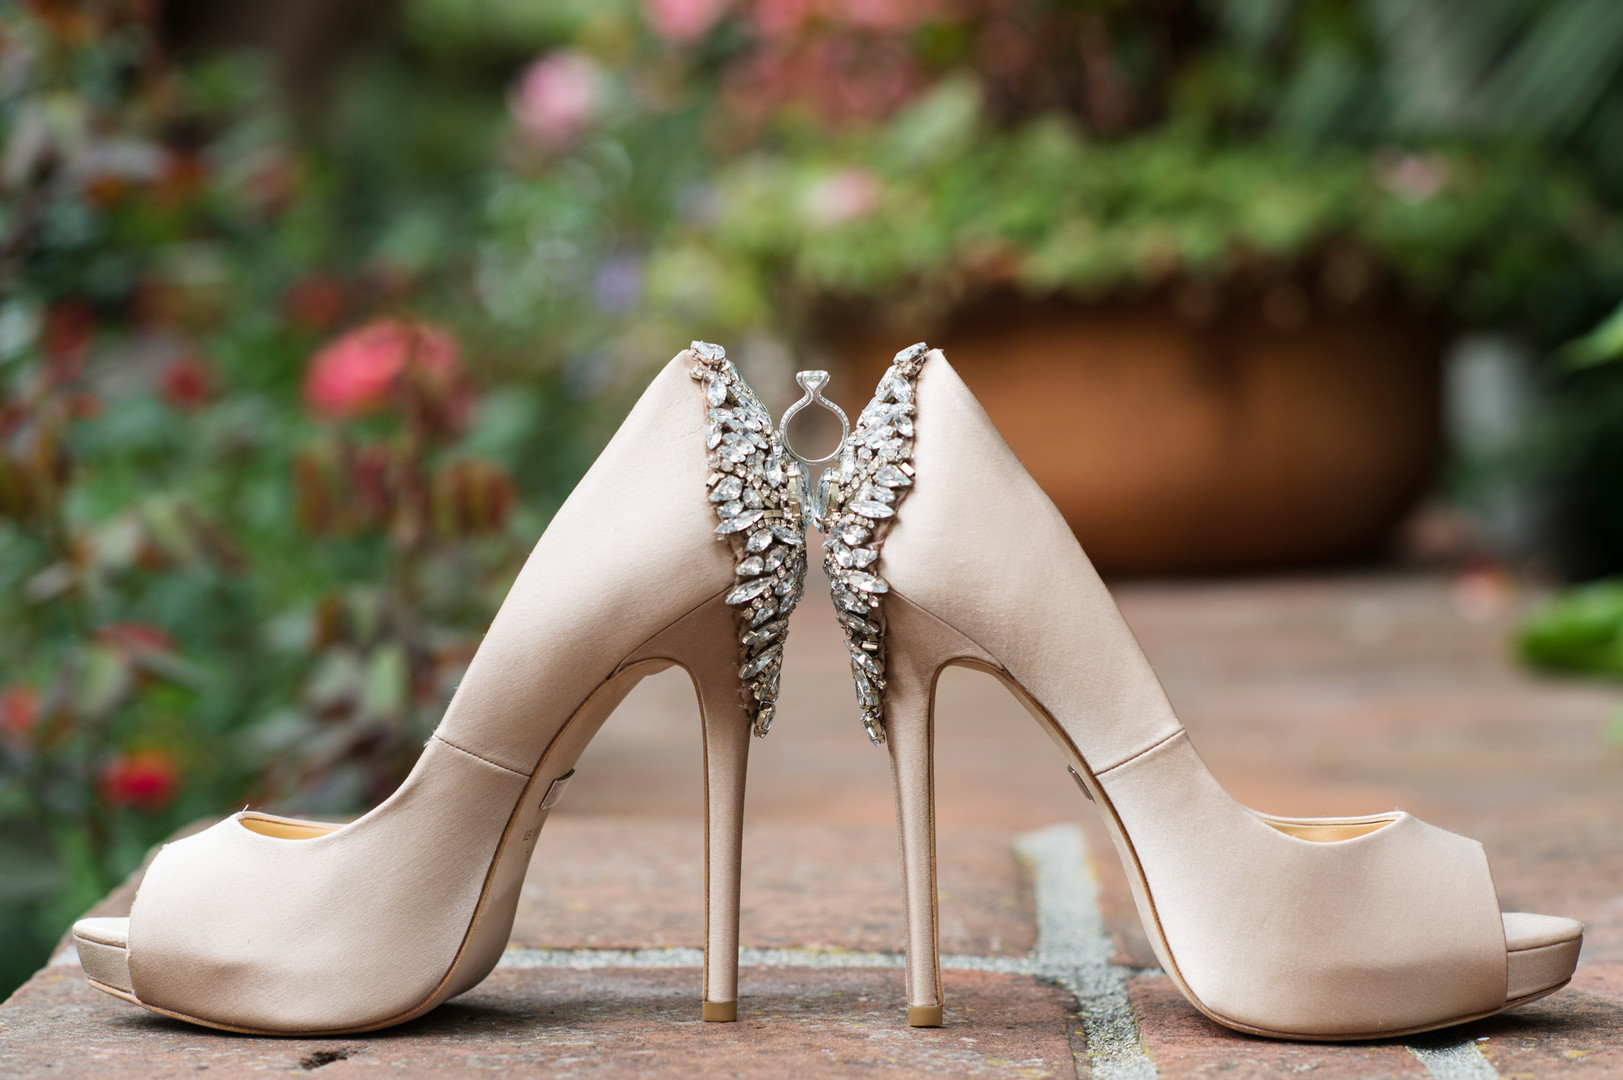 www.santabarbarawedding.com   The Big Affair   Four Seasons The Biltmore Santa Barbara   Bride's Shoes and Engagement Ring